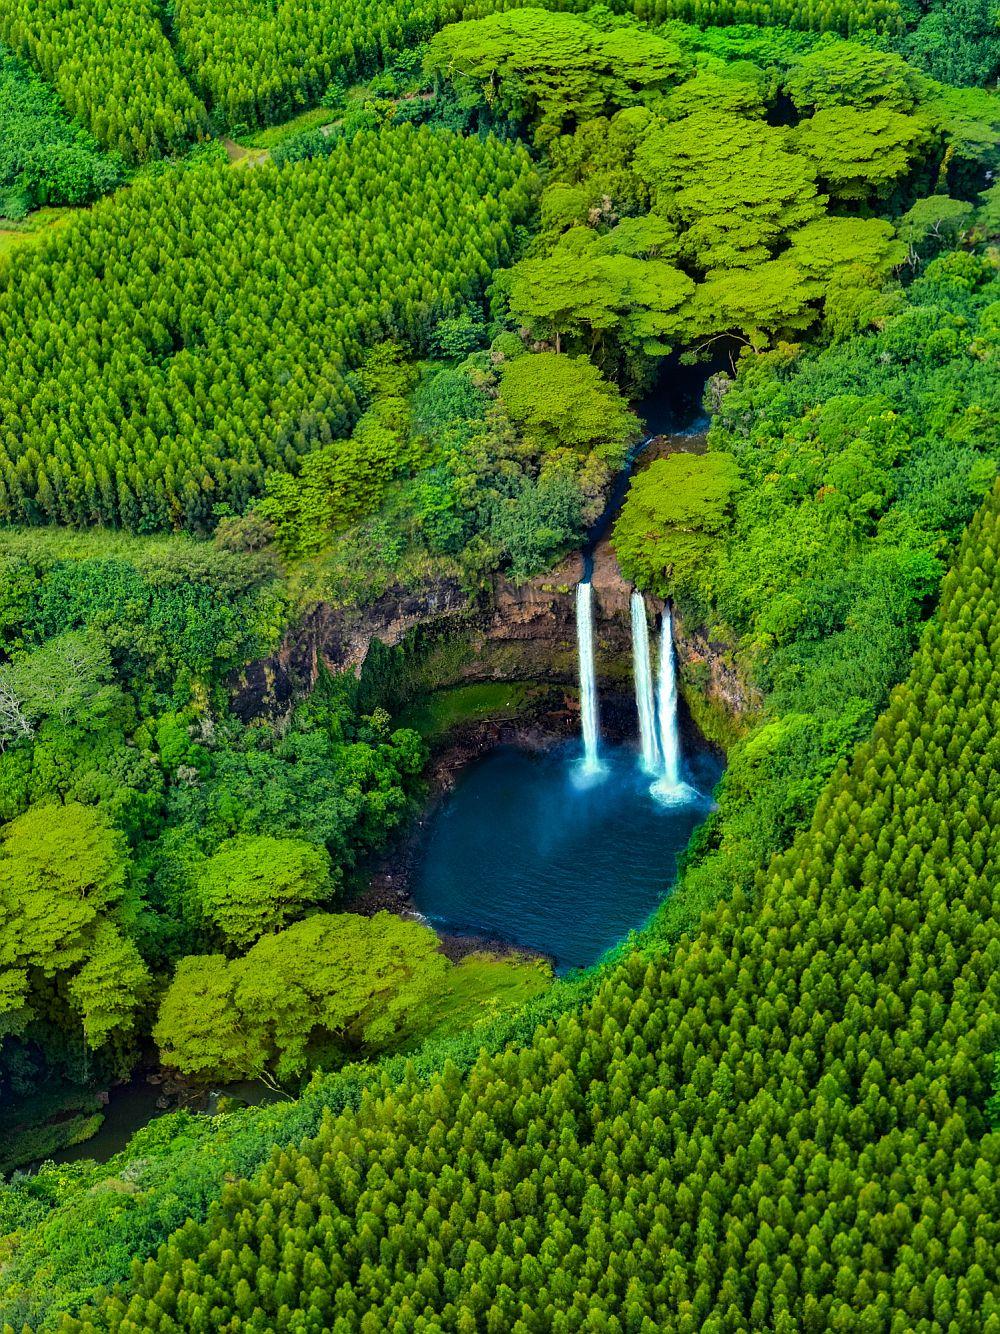 Wailua Waterfalls in Hawaii